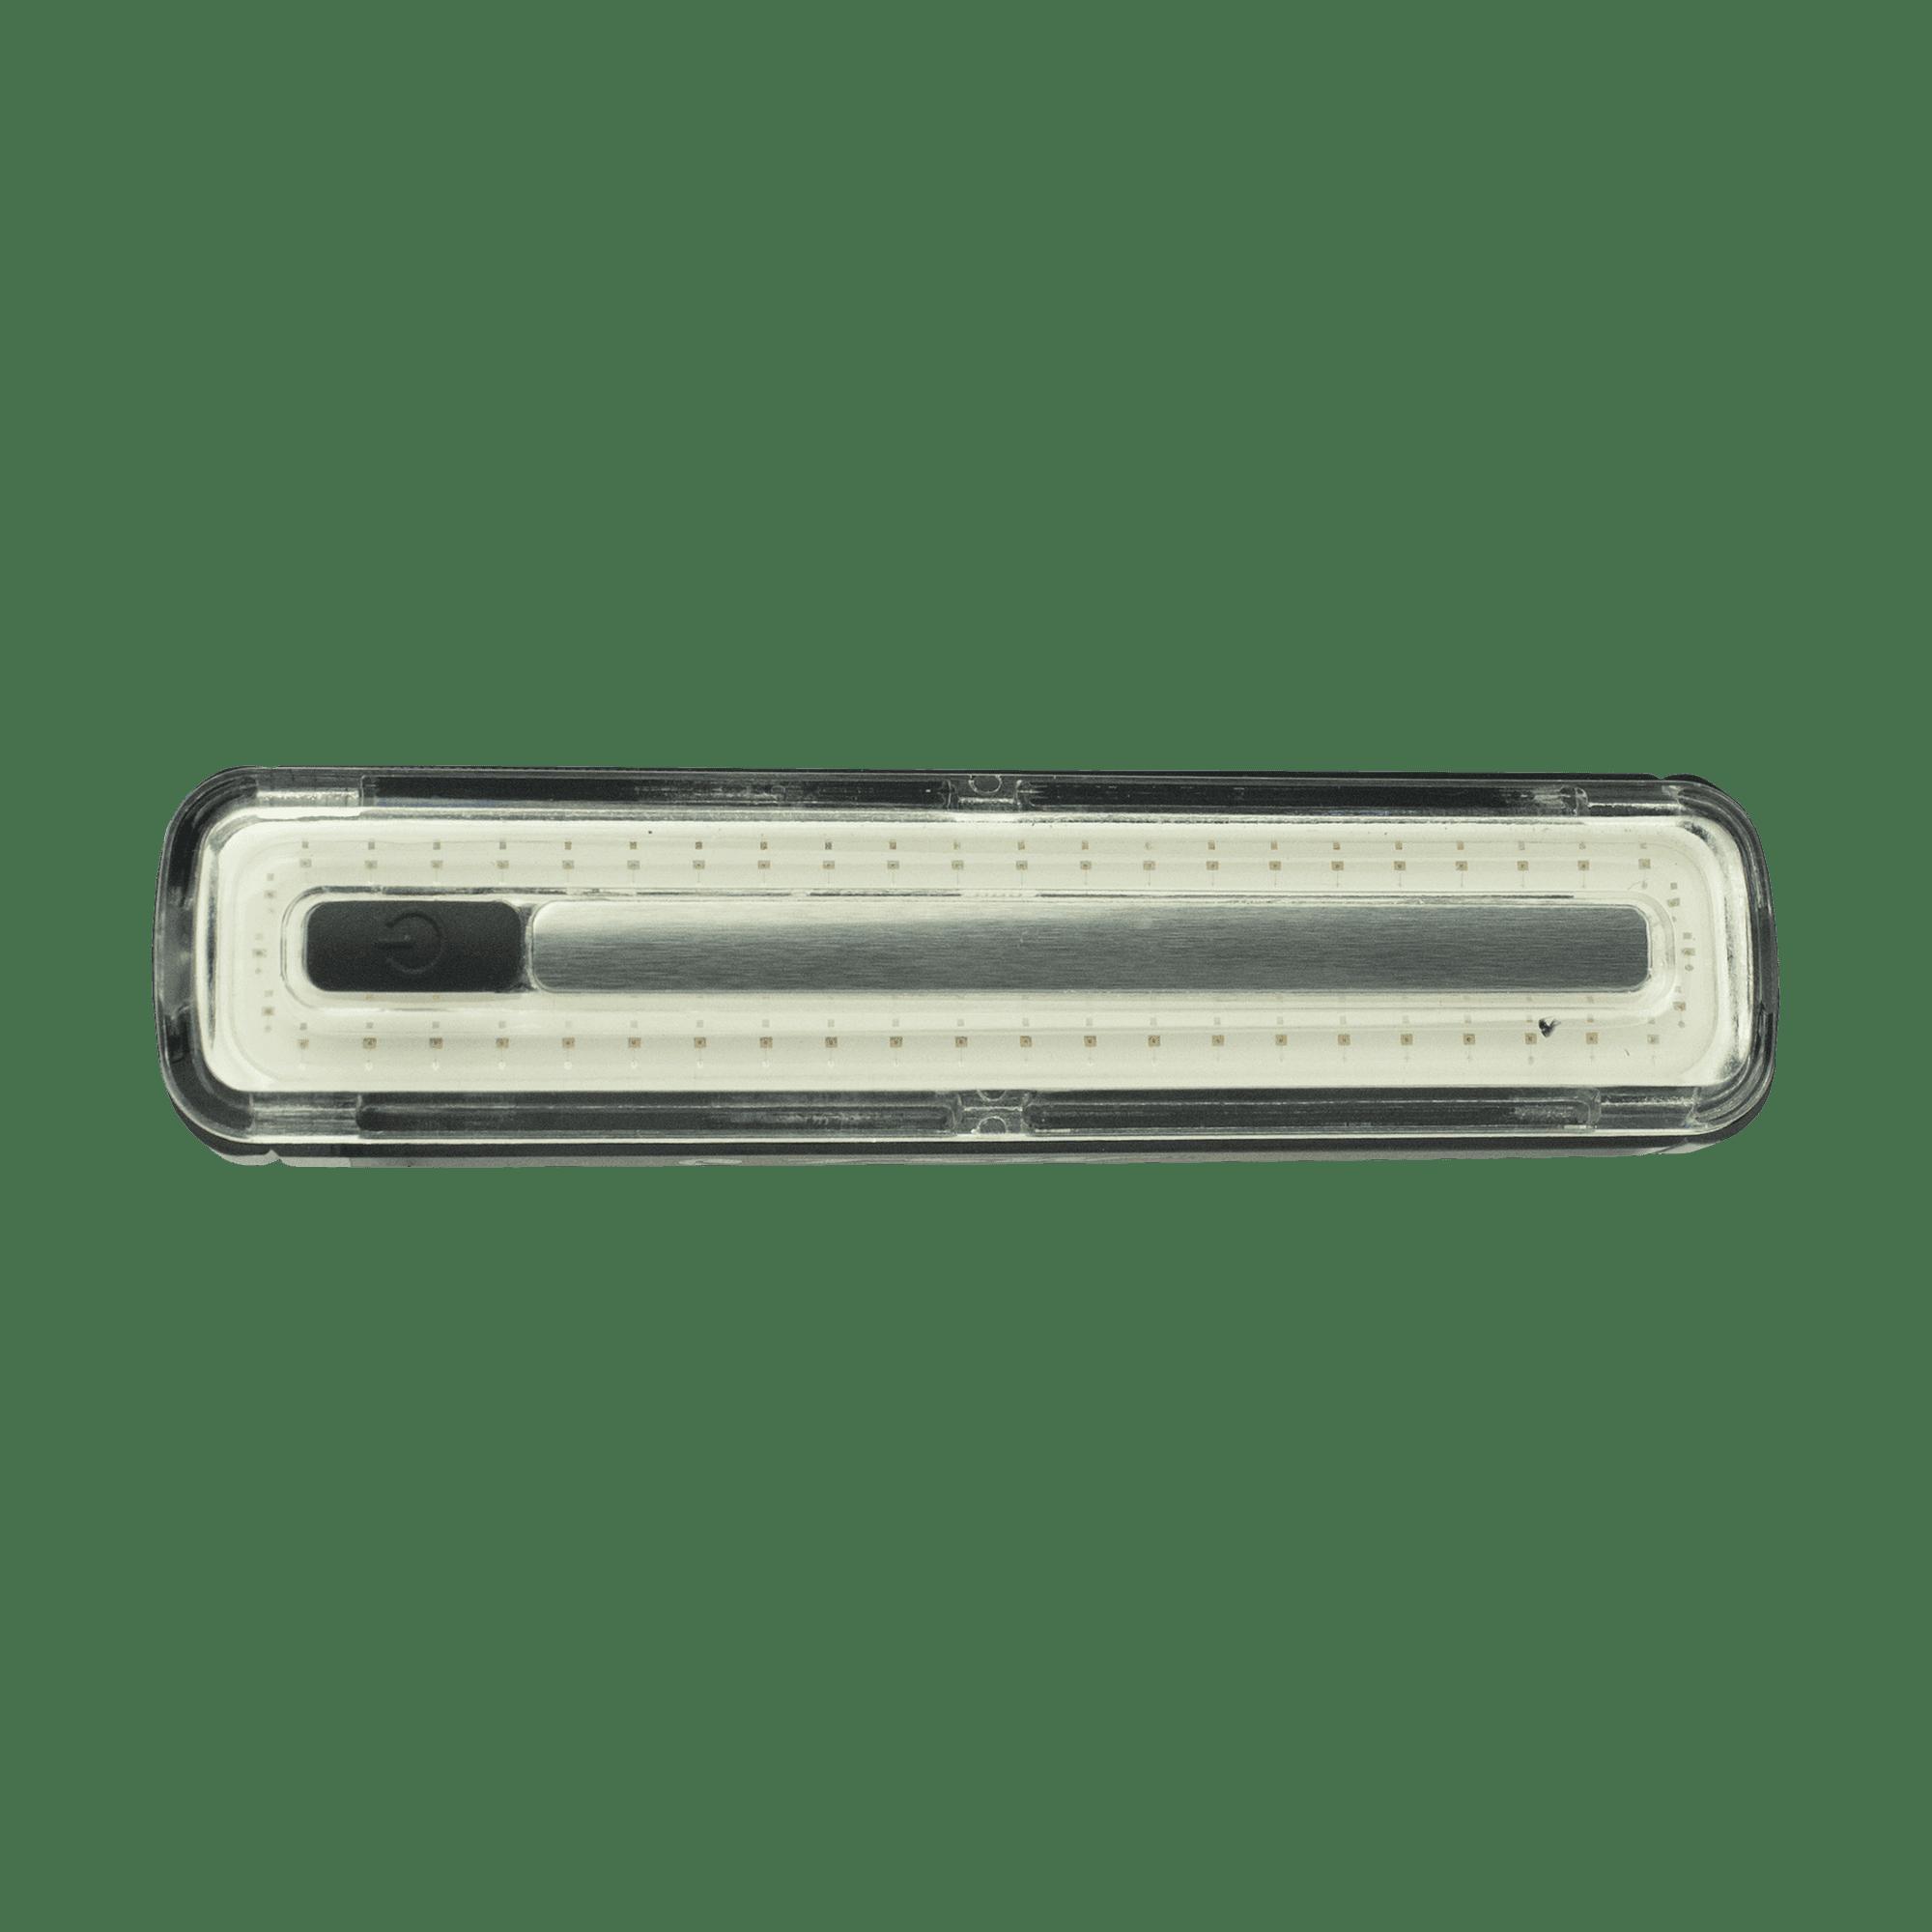 08661 -Refletor Traseiro 50 Lumens